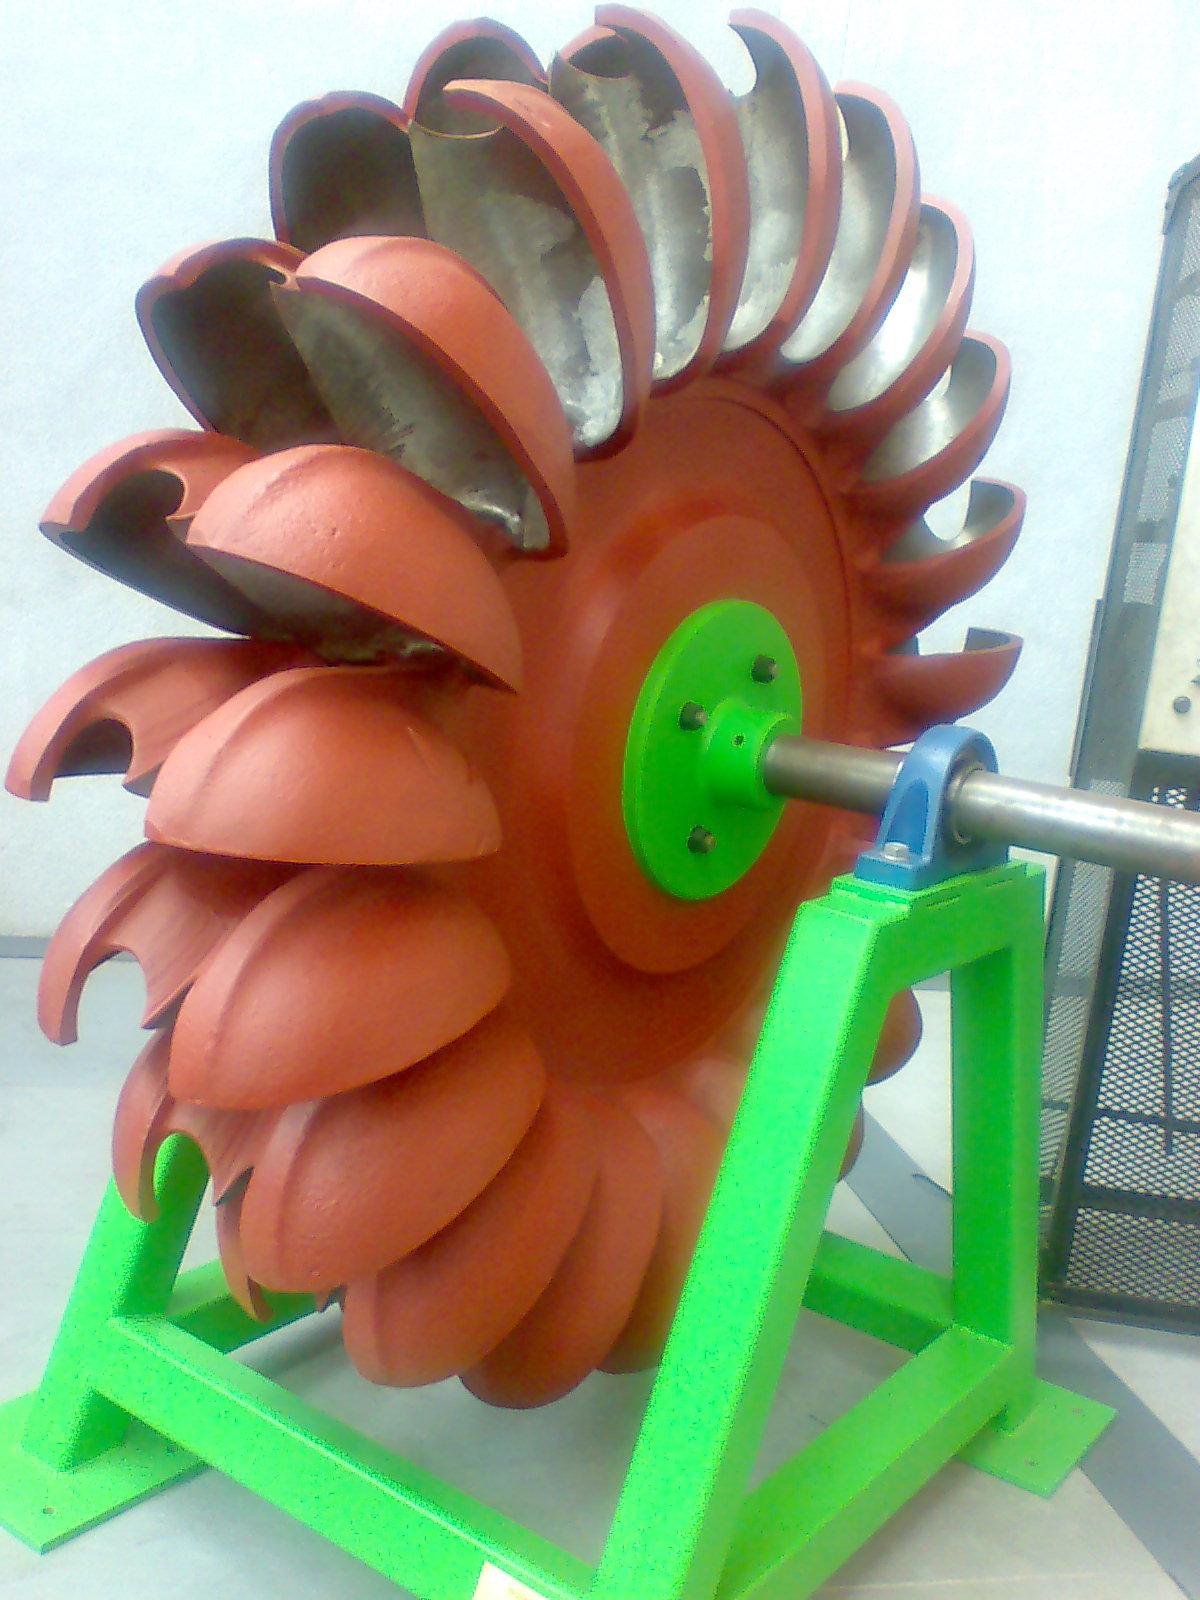 File:Turbina hidraúlica.jpg - Wikimedia Commons